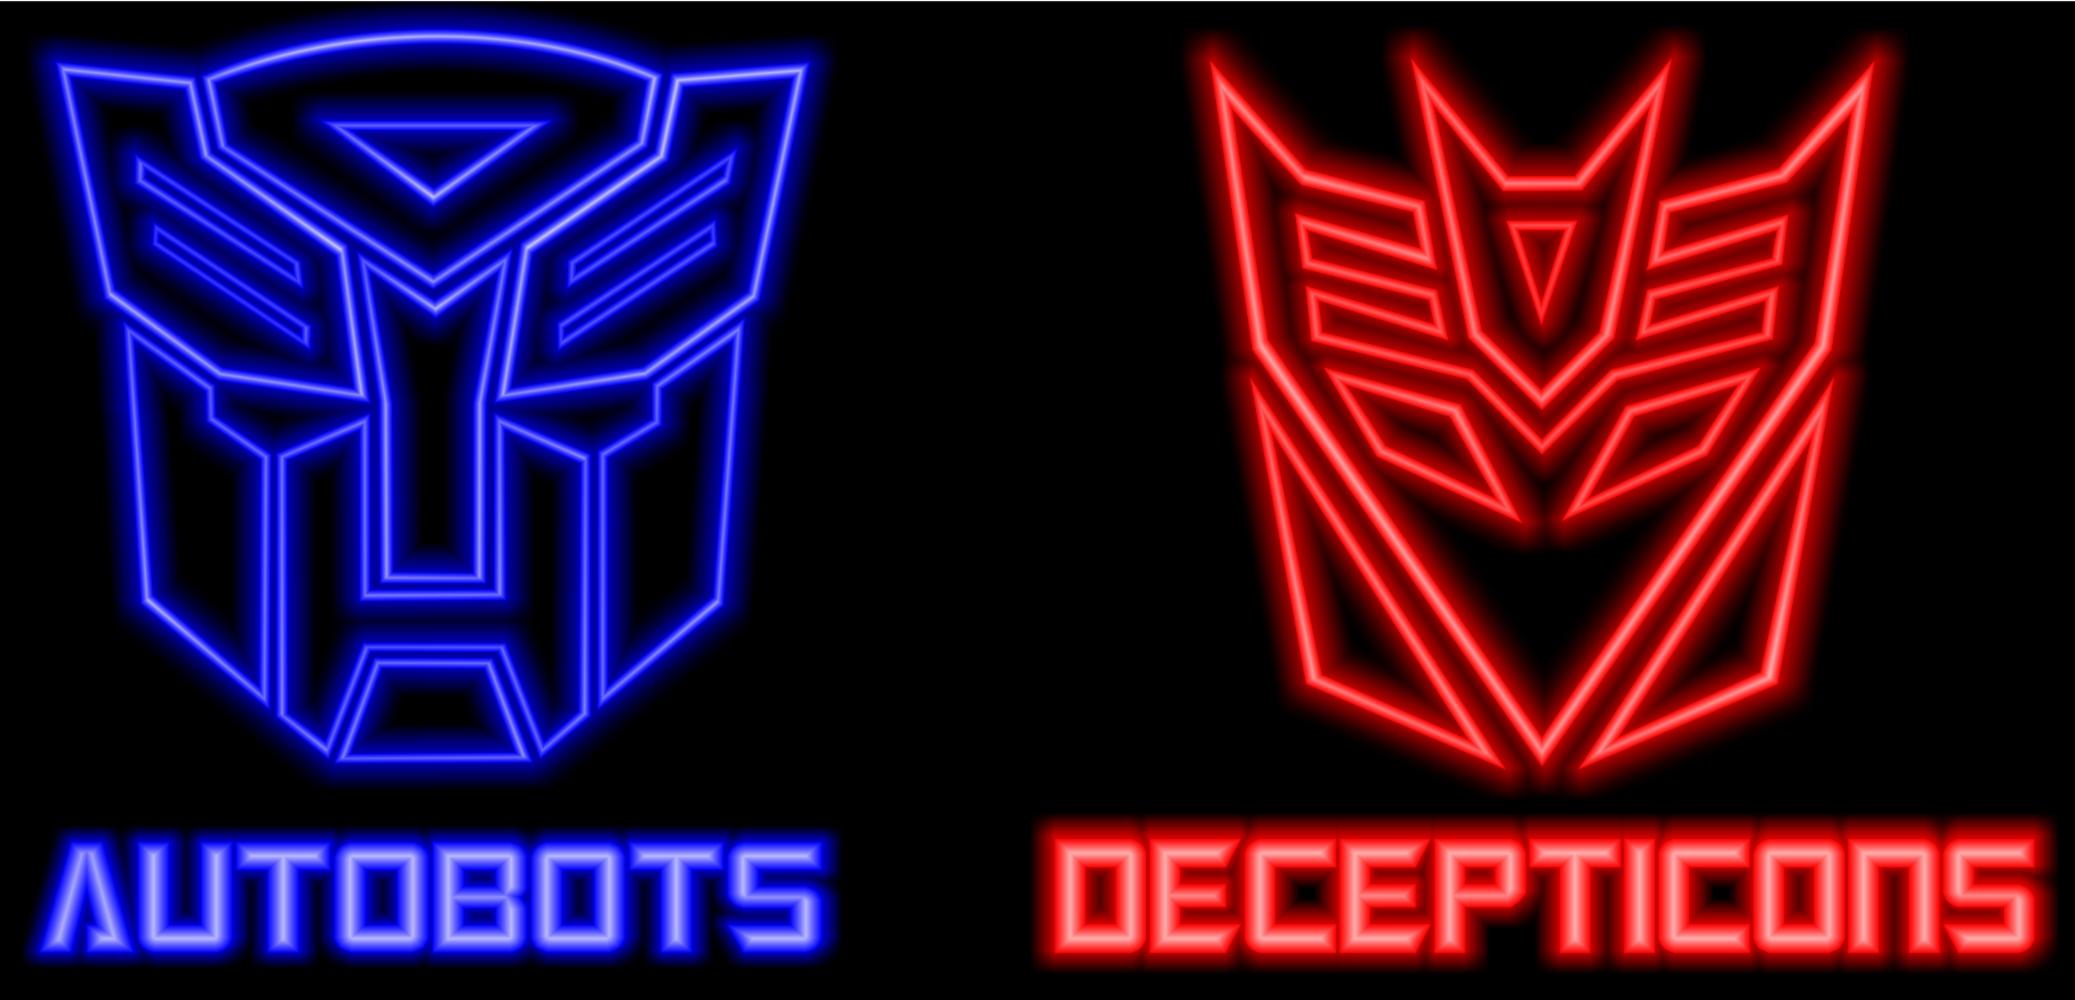 autobots and decepticons logos